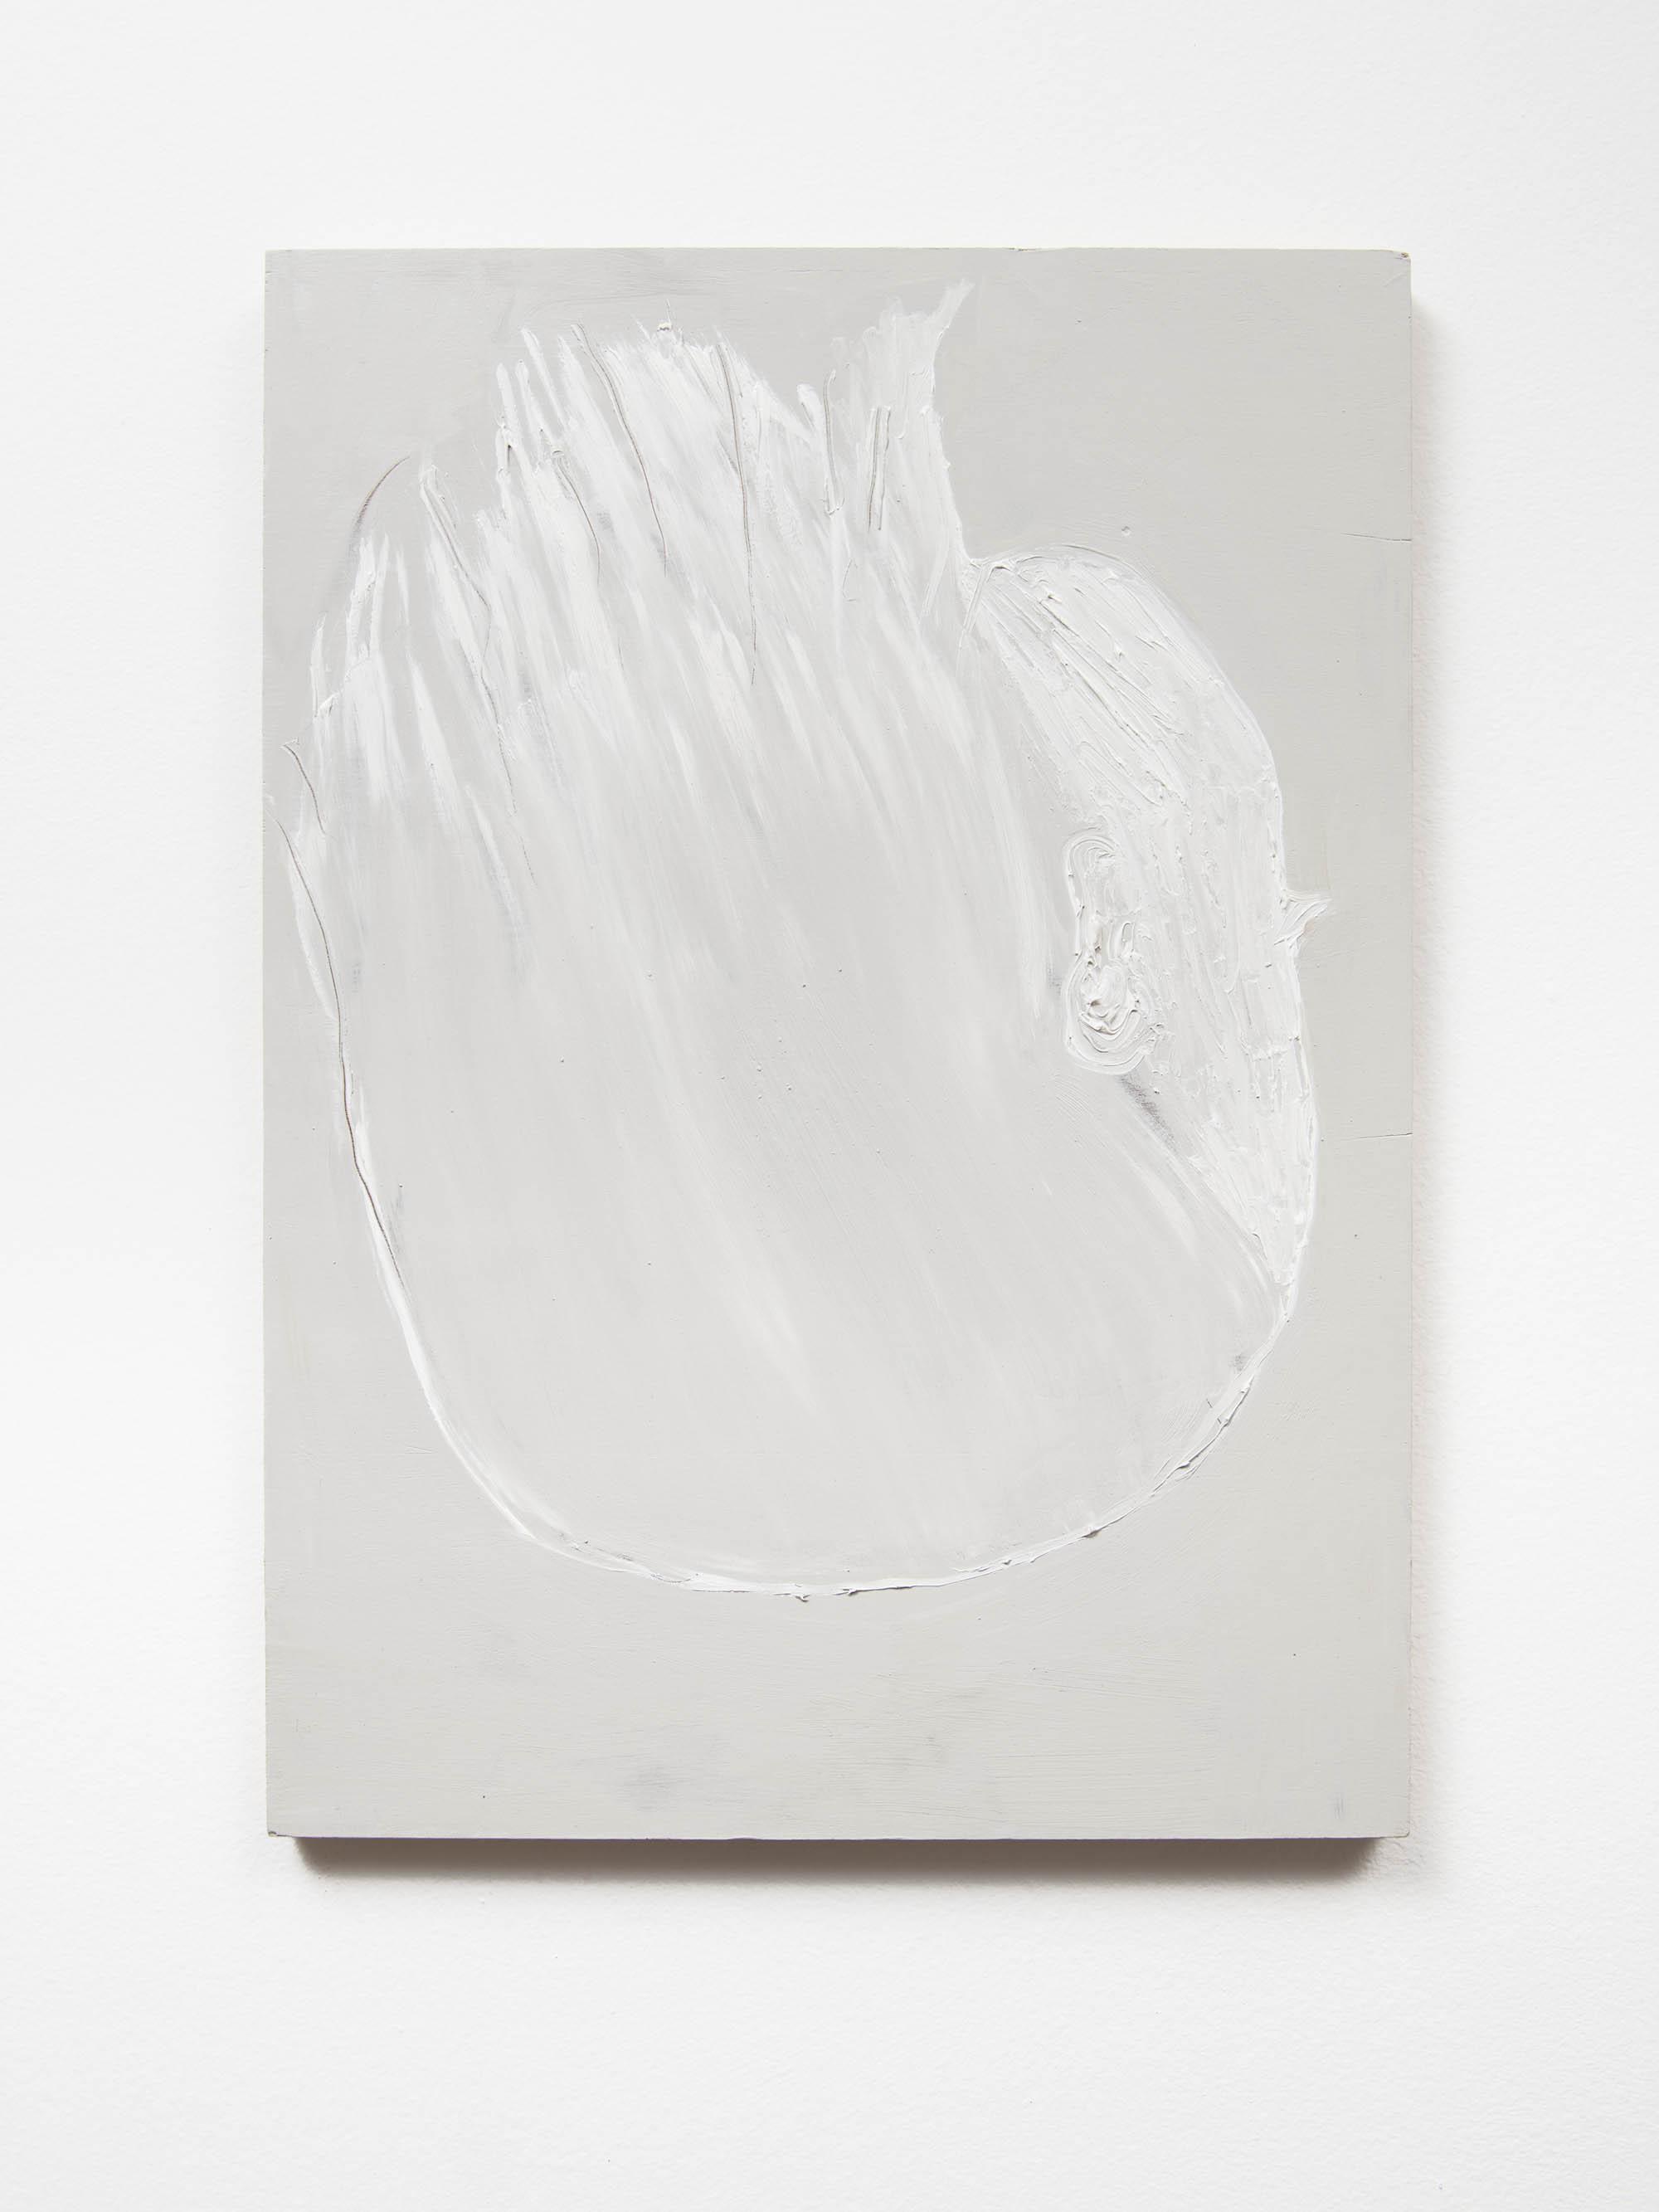 Menina | Girl   2013  óleo sobre madeira |  oil on wood   52 x 37 cm